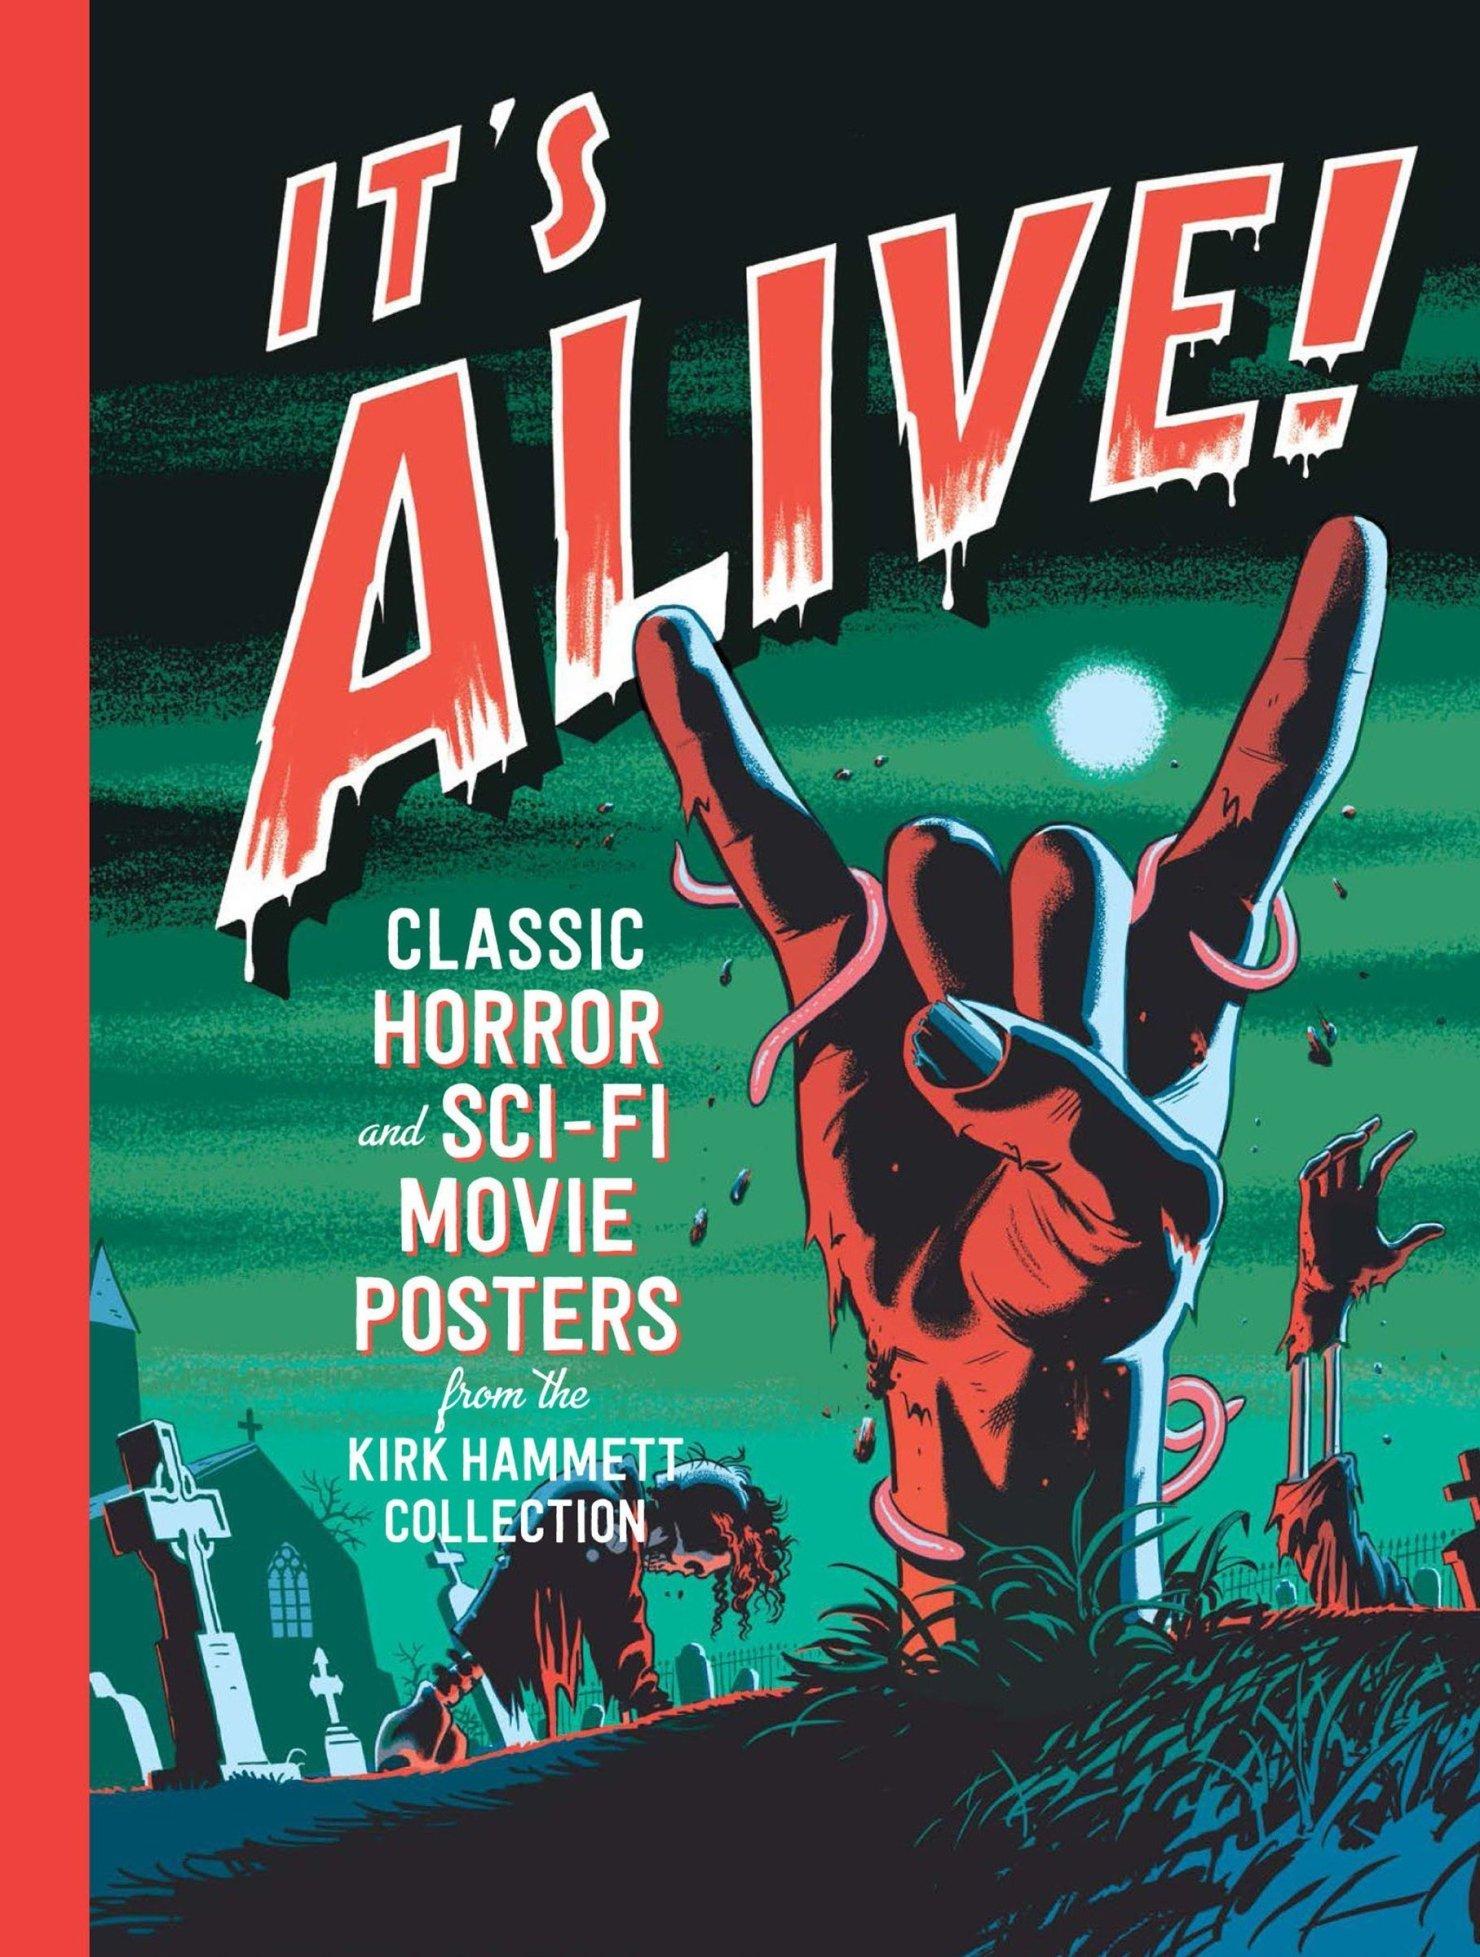 Kirk Hammett It's Alive affiche